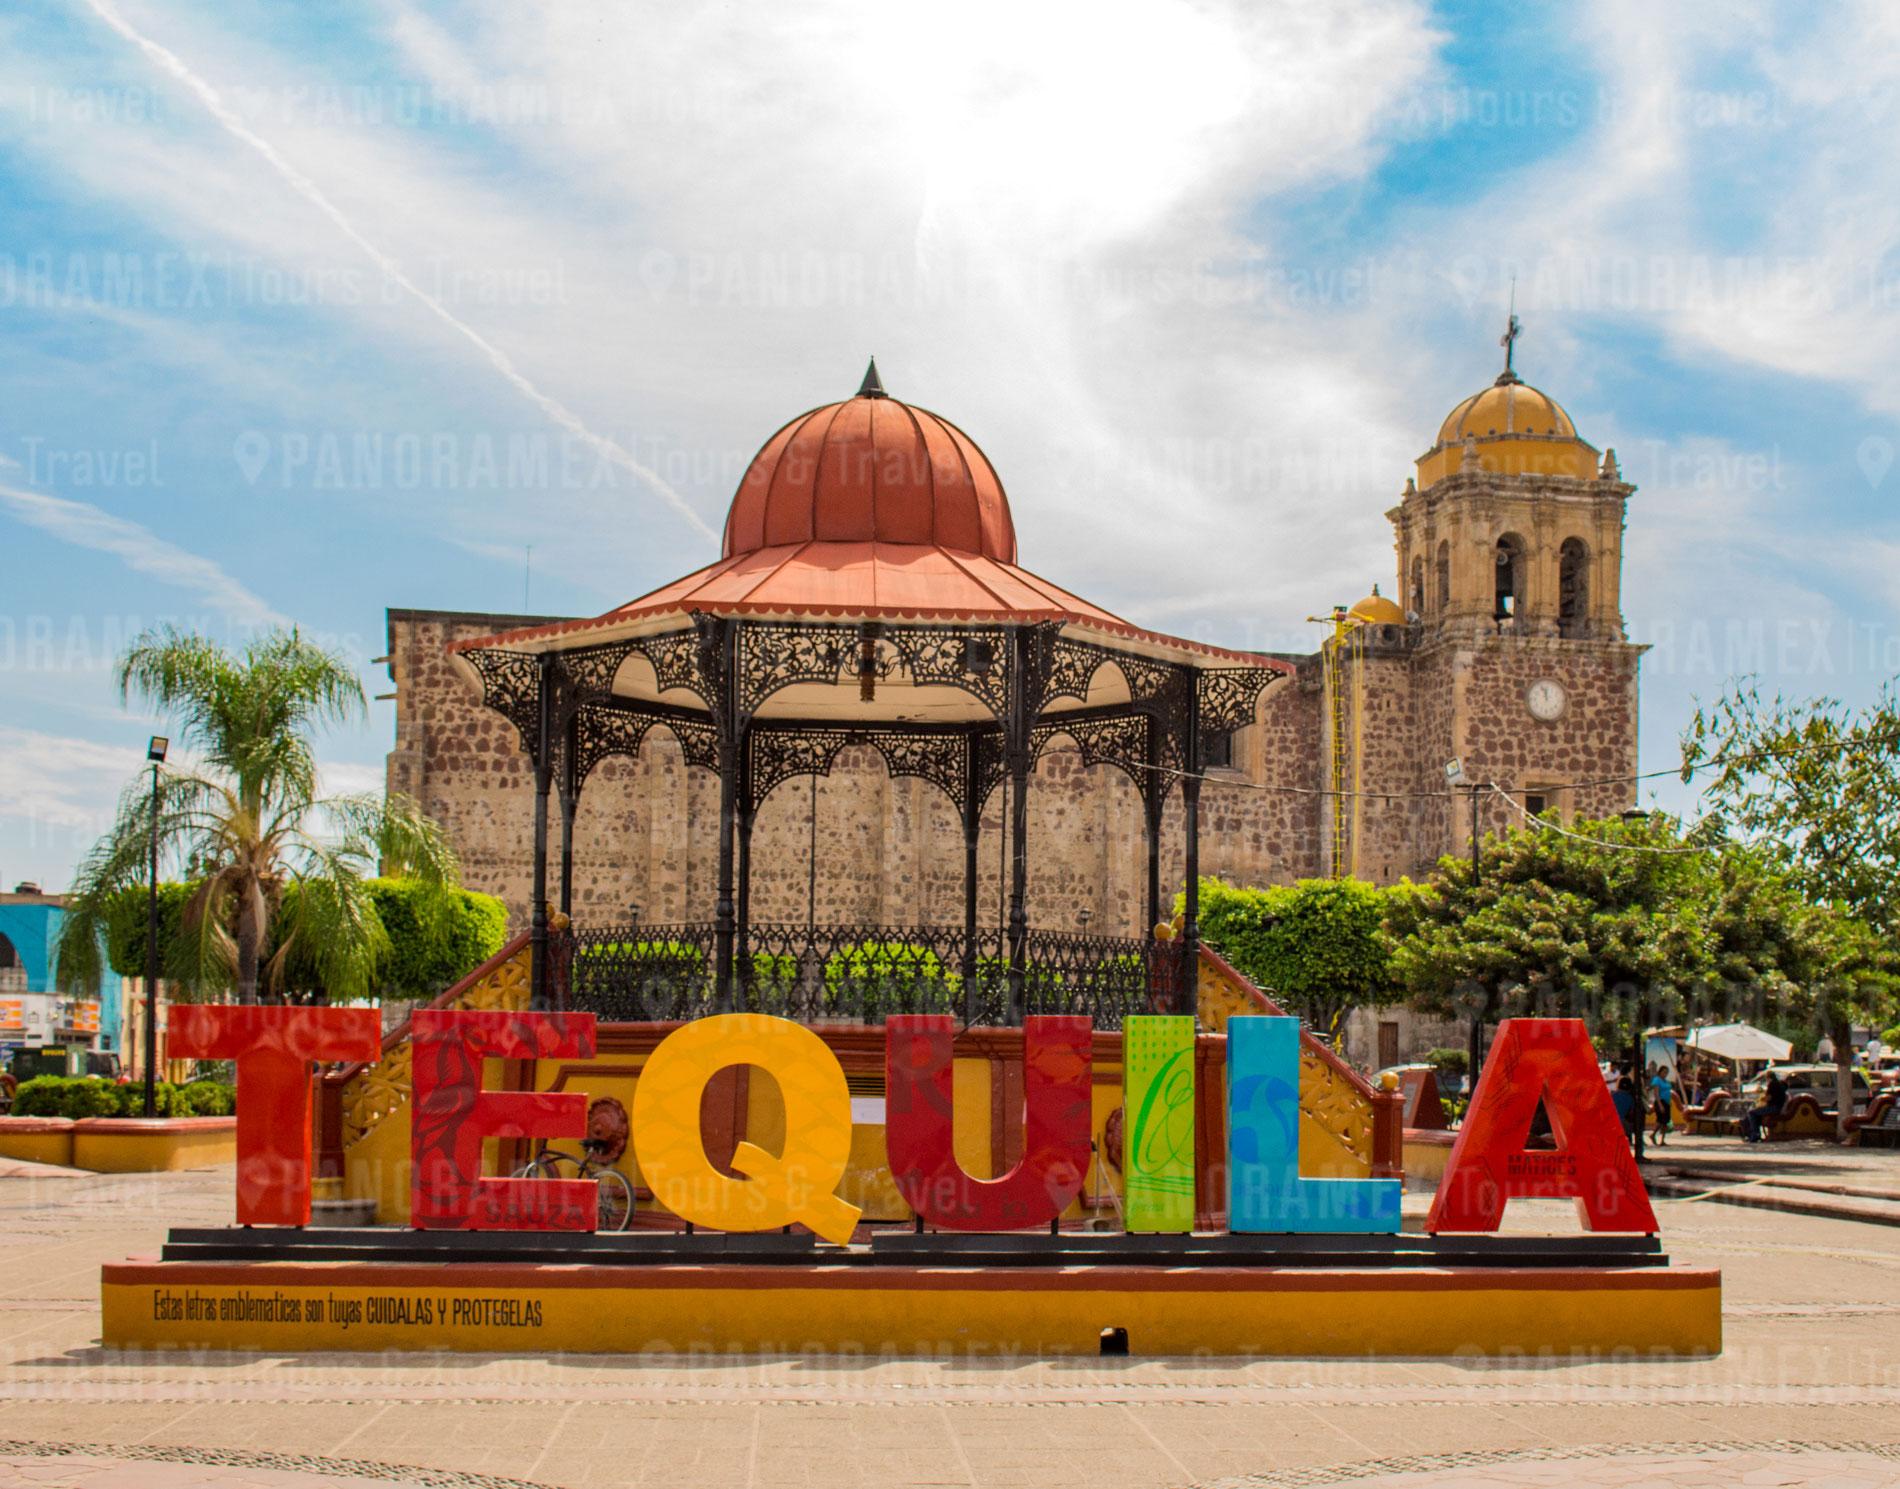 Tequila-Jalisco